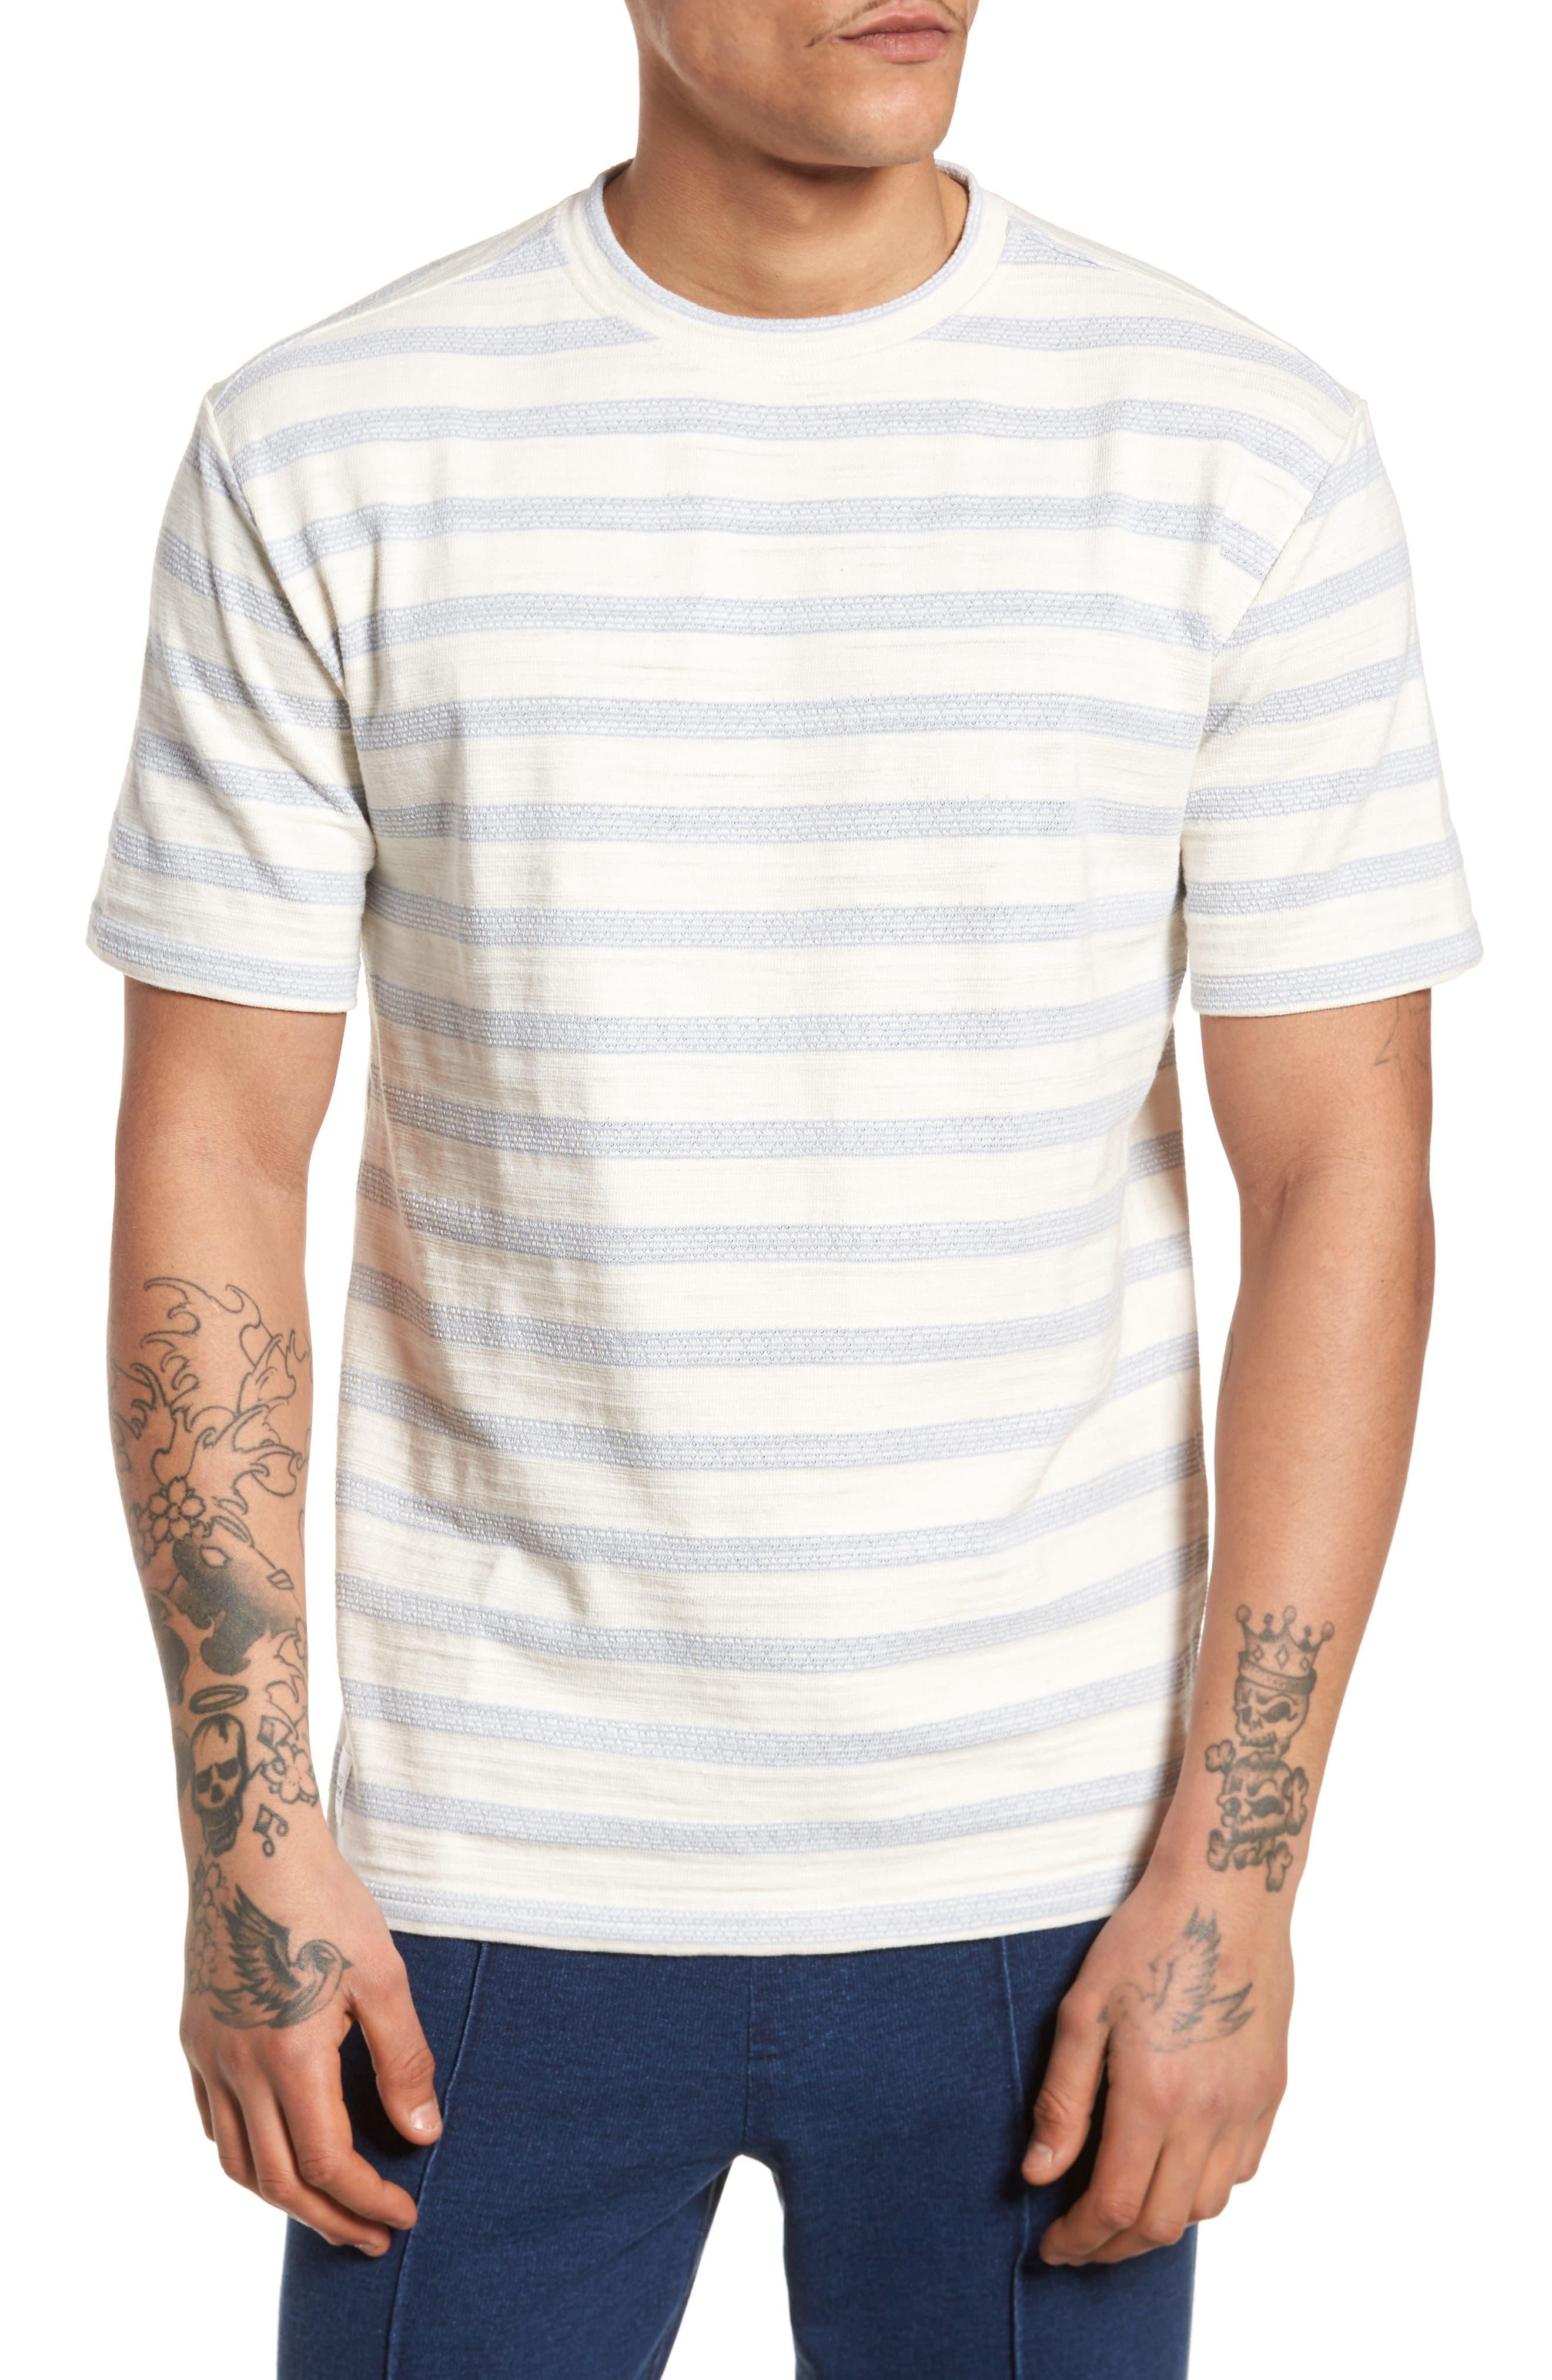 Waves T-Shirt,                             Main thumbnail 1, color,                             Off White